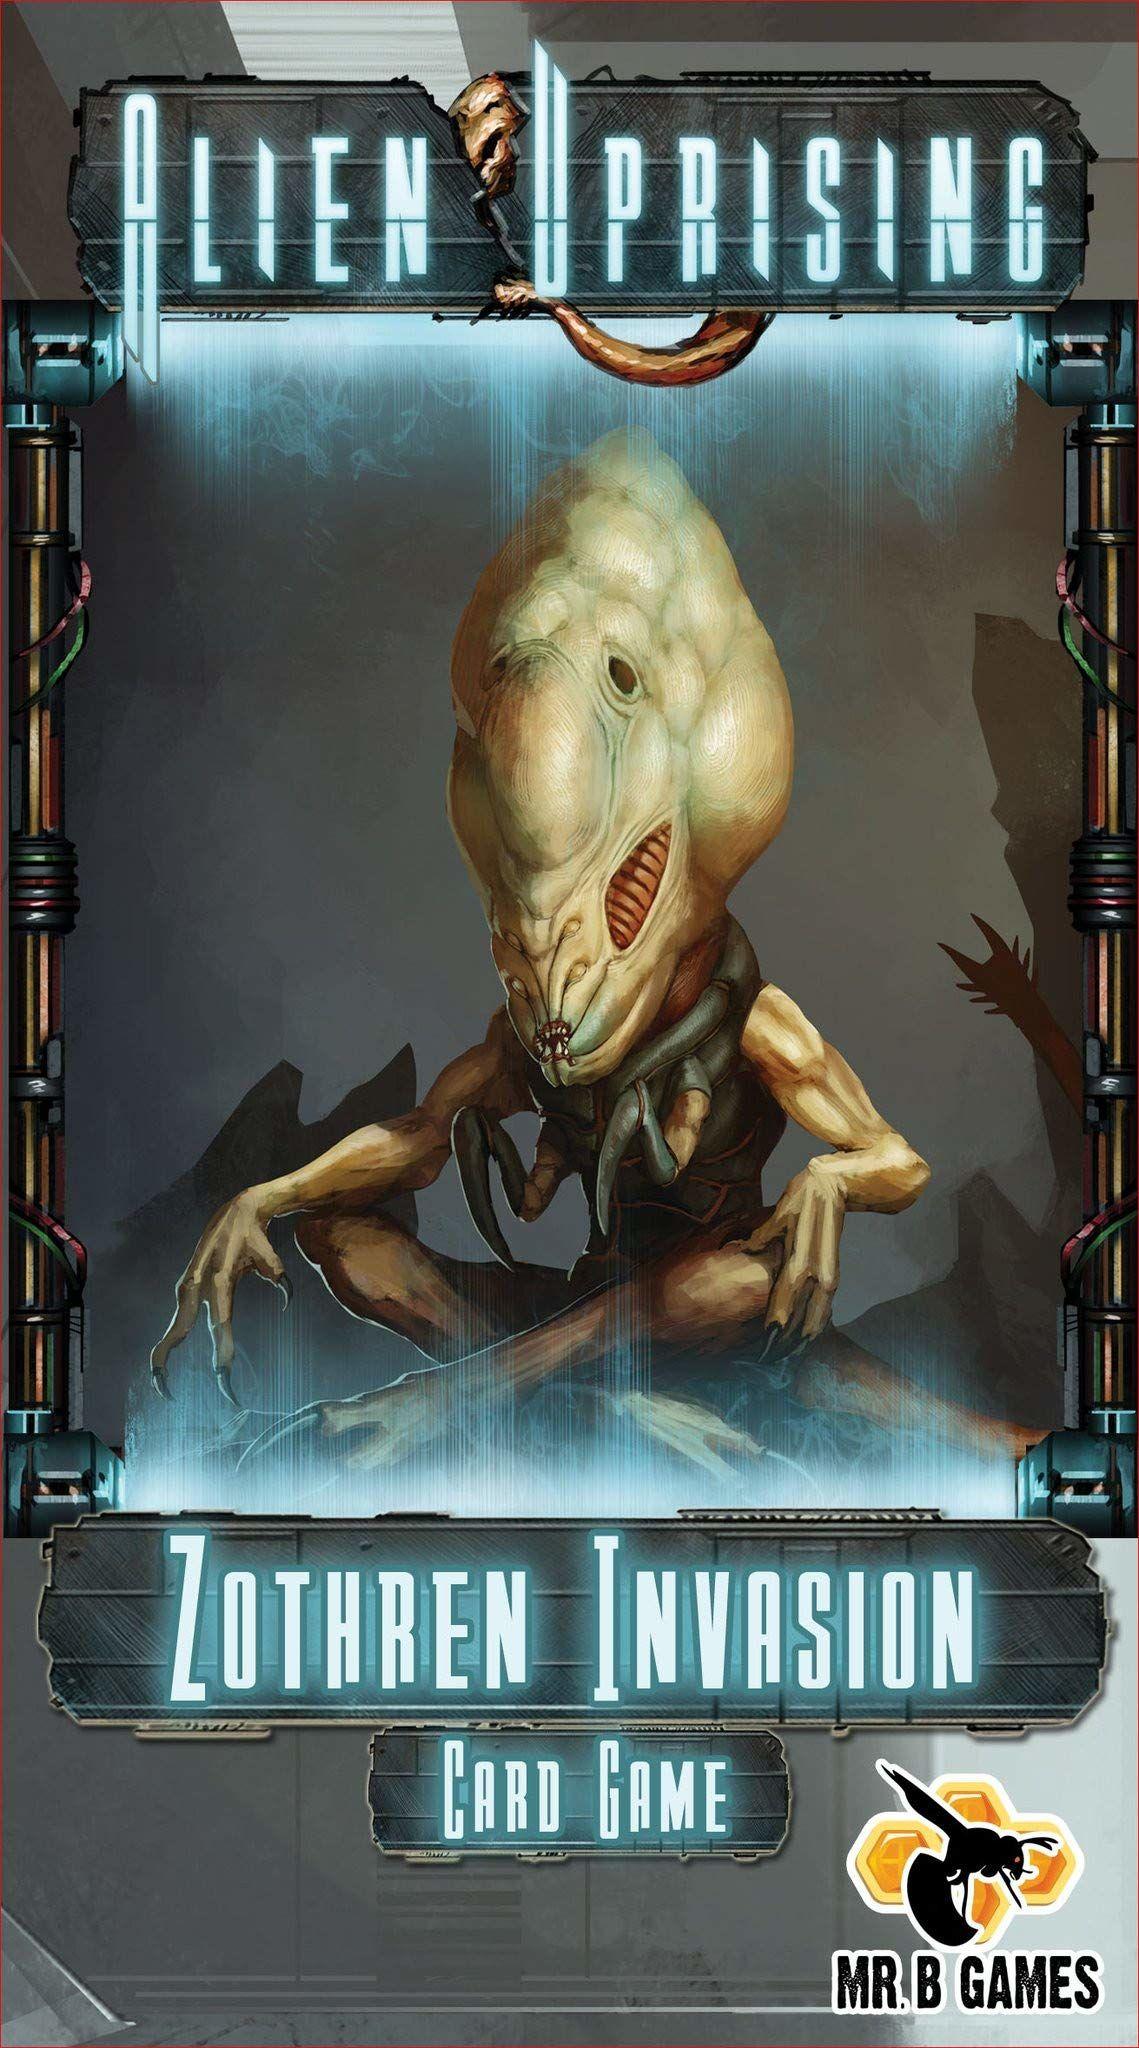 Mr. B Games MBG01021 - ZothrInvasion - An Alien Uprising stand alone card game